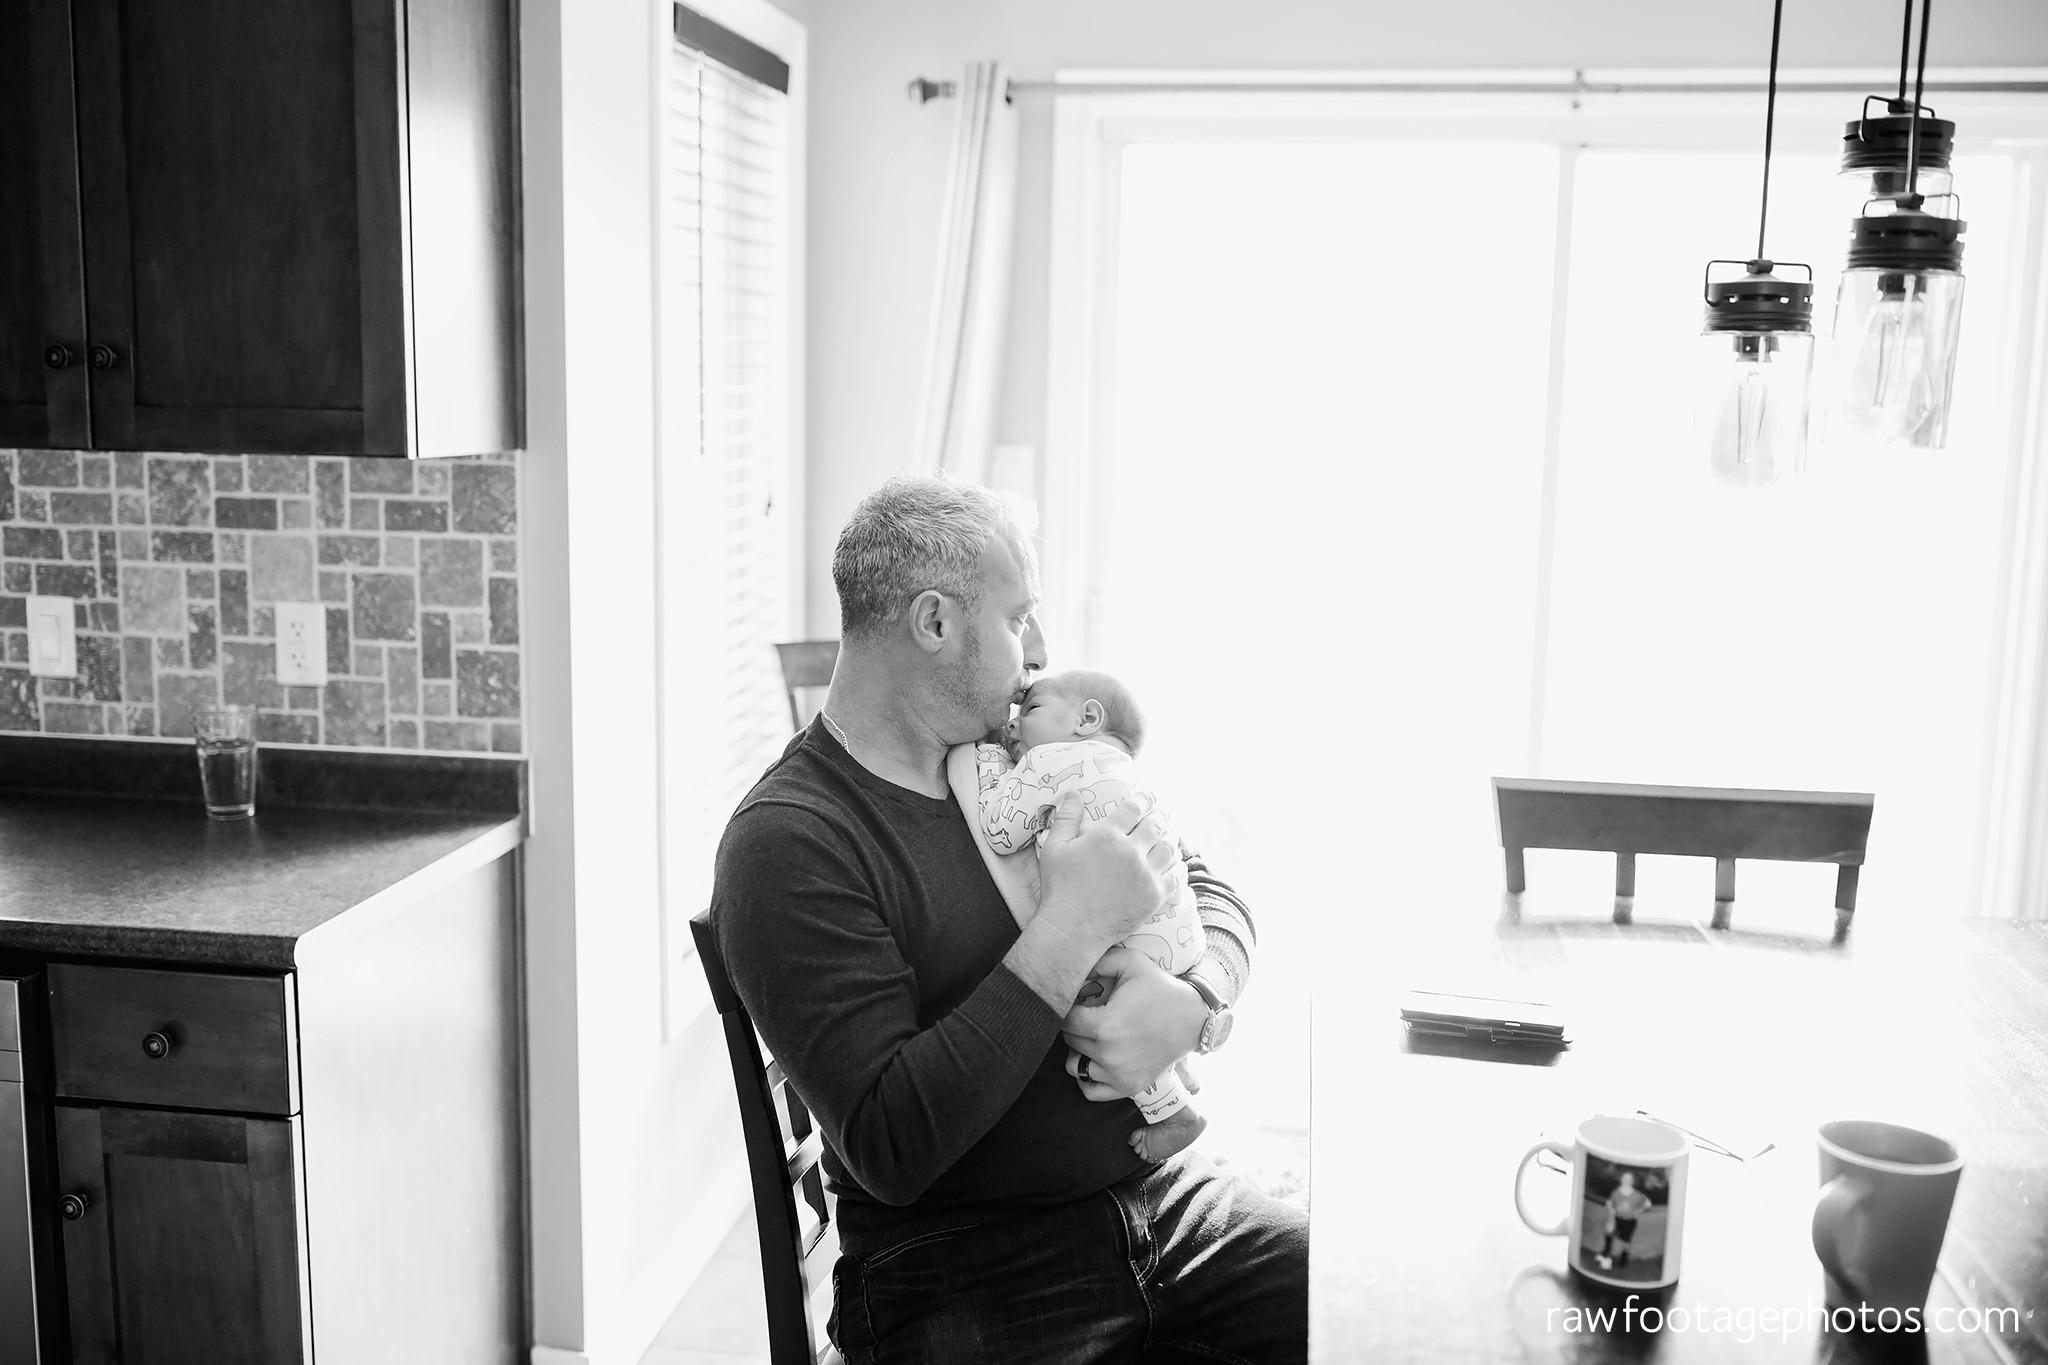 london_ontario_newborn_lifestyle_photographer-baby_nate-raw_footage_photography001.jpg